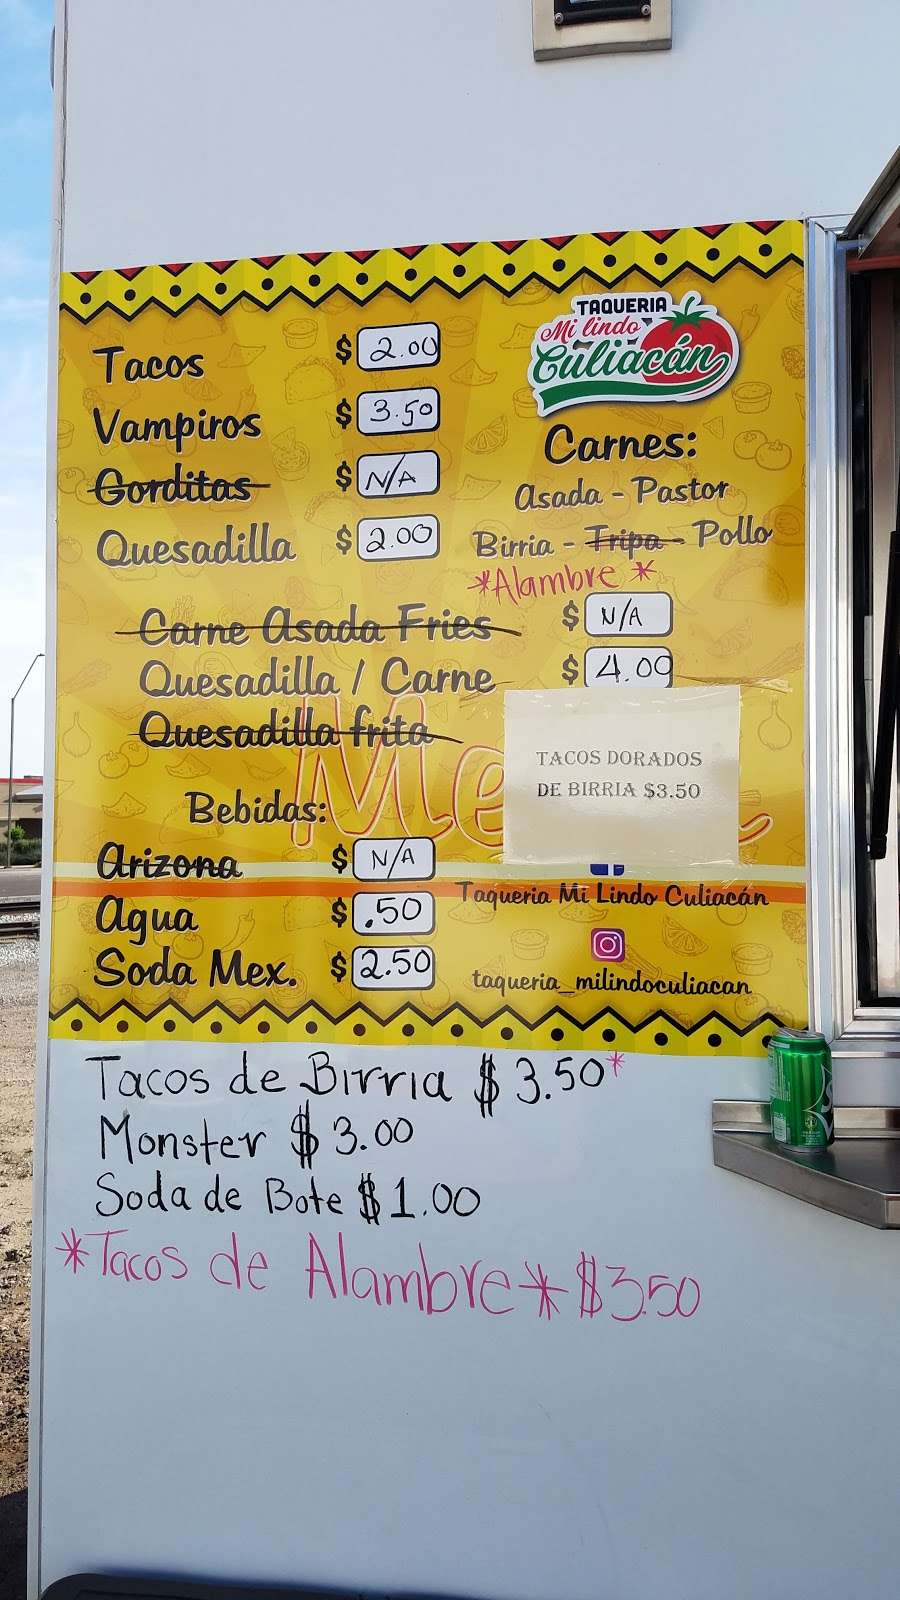 Taqueria Mi Lindo Culiacan - restaurant    Photo 3 of 4   Address: 10907 W Buckeye Rd, Avondale, AZ 85323, USA   Phone: (623) 999-0025